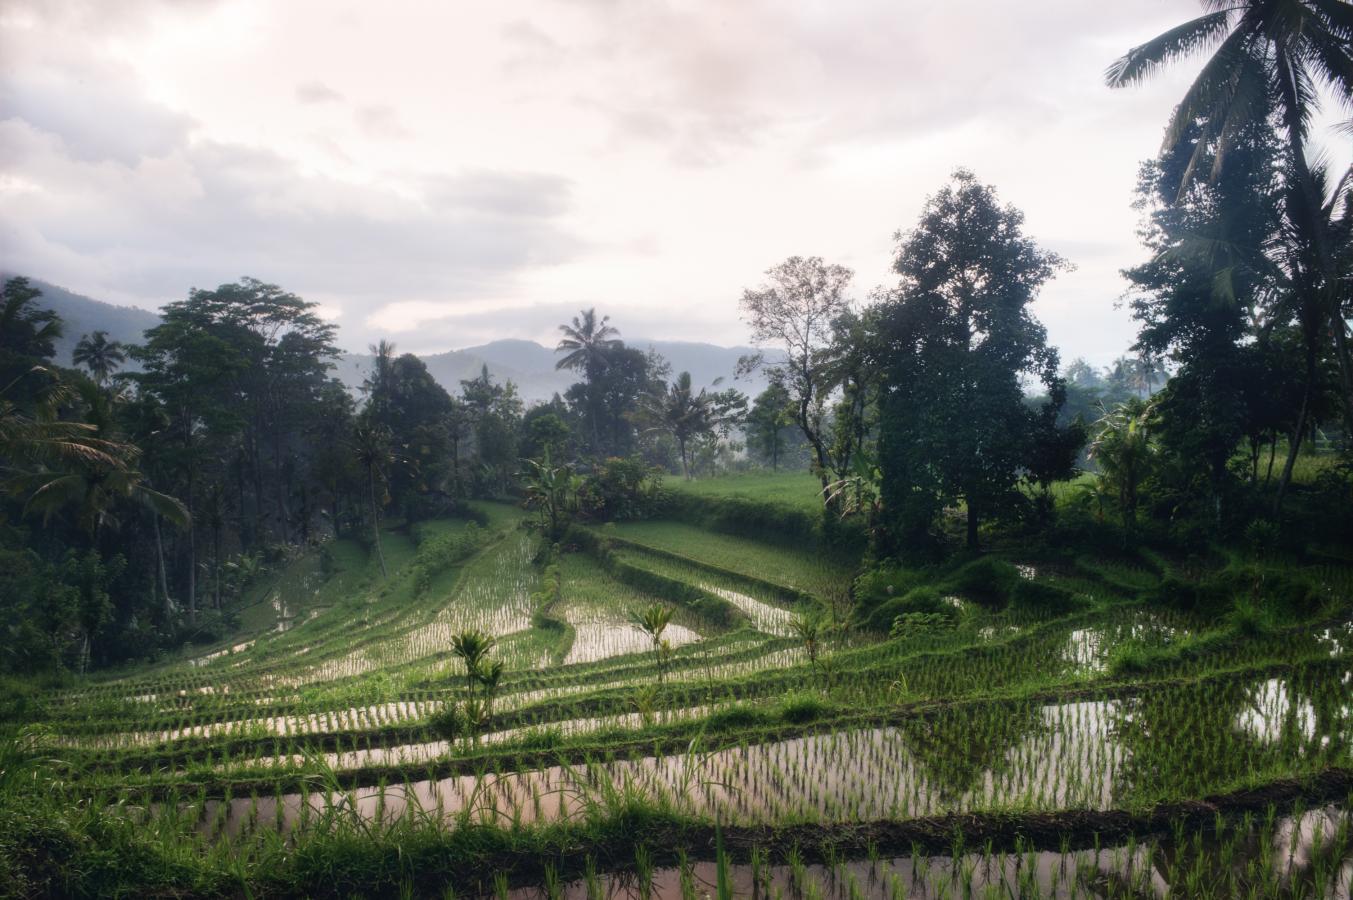 rice-paddy-field-during-sunrise-somewhere-around-sidemen-bali-2010